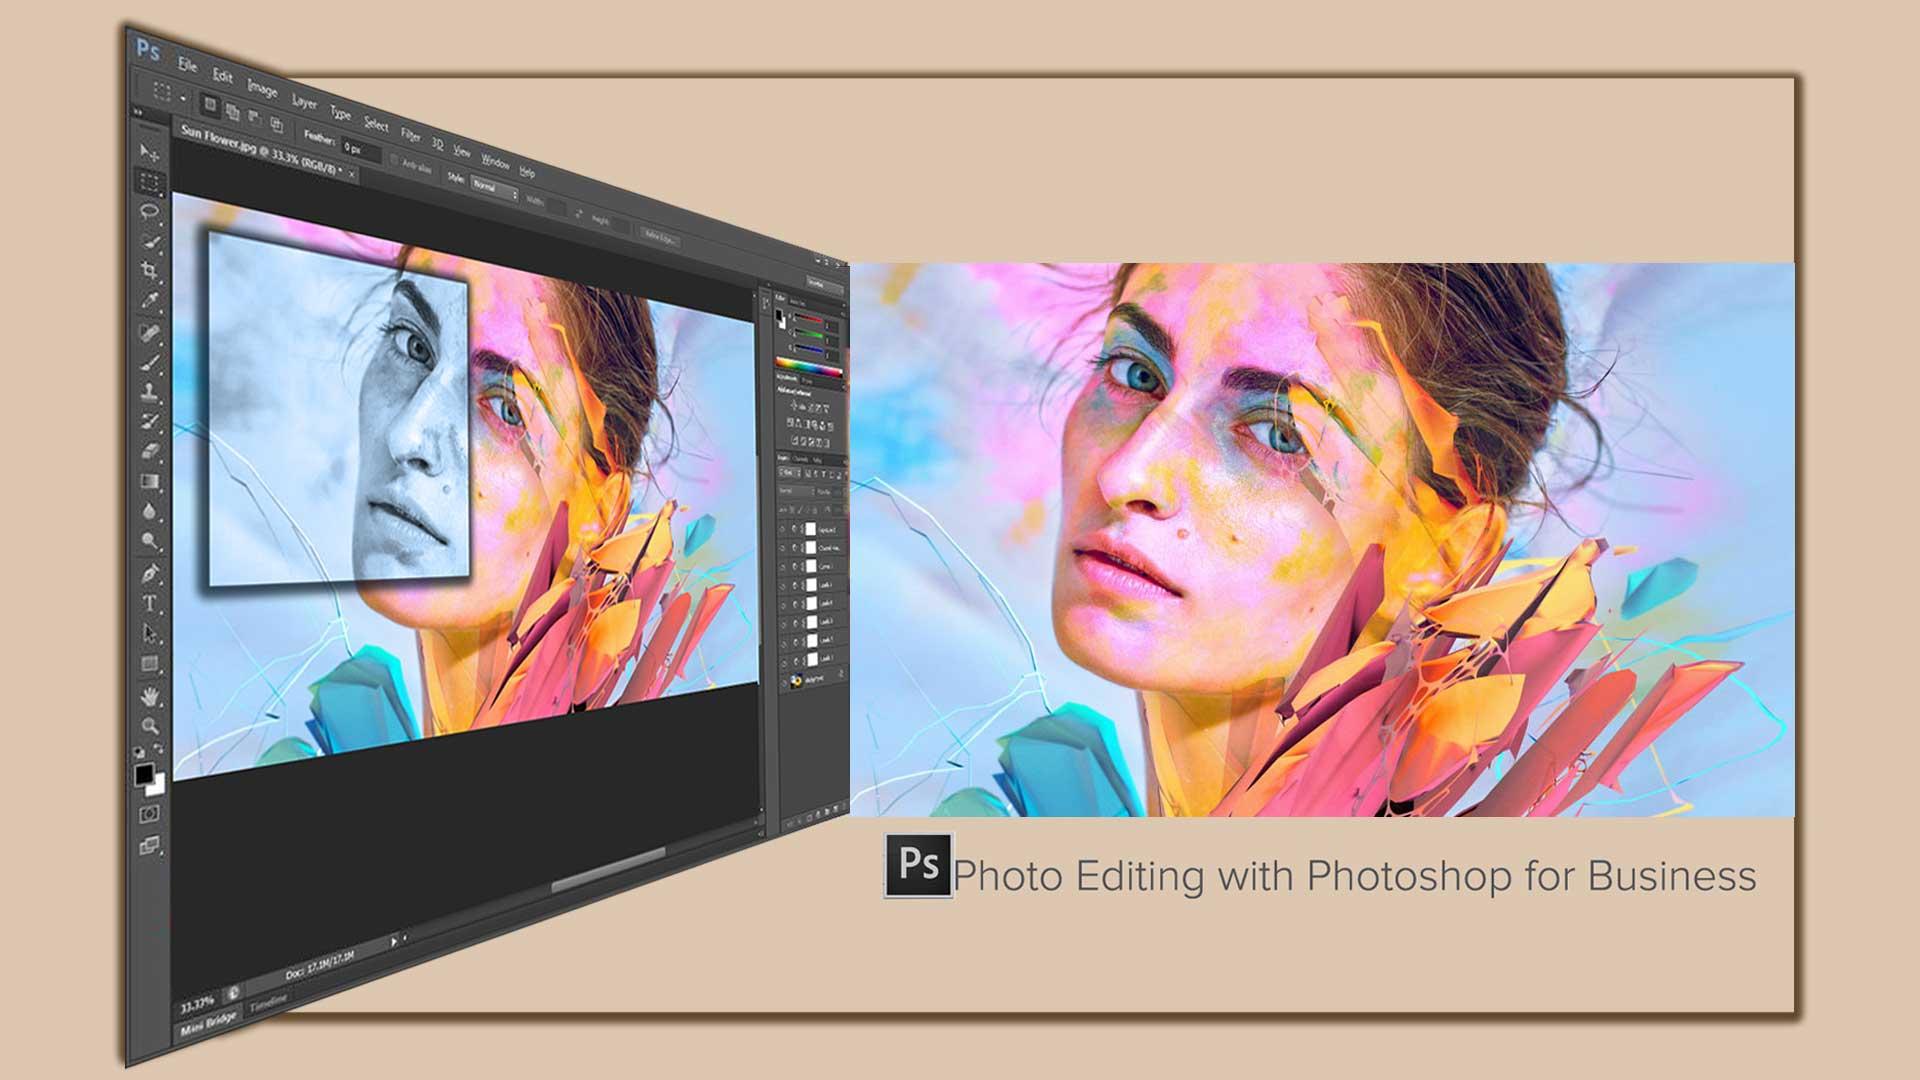 Photo editing  Photoshop 3 - 8 تا از مزایای اصلی ویرایش عکس با فتوشاپ برای کسب و کارتان